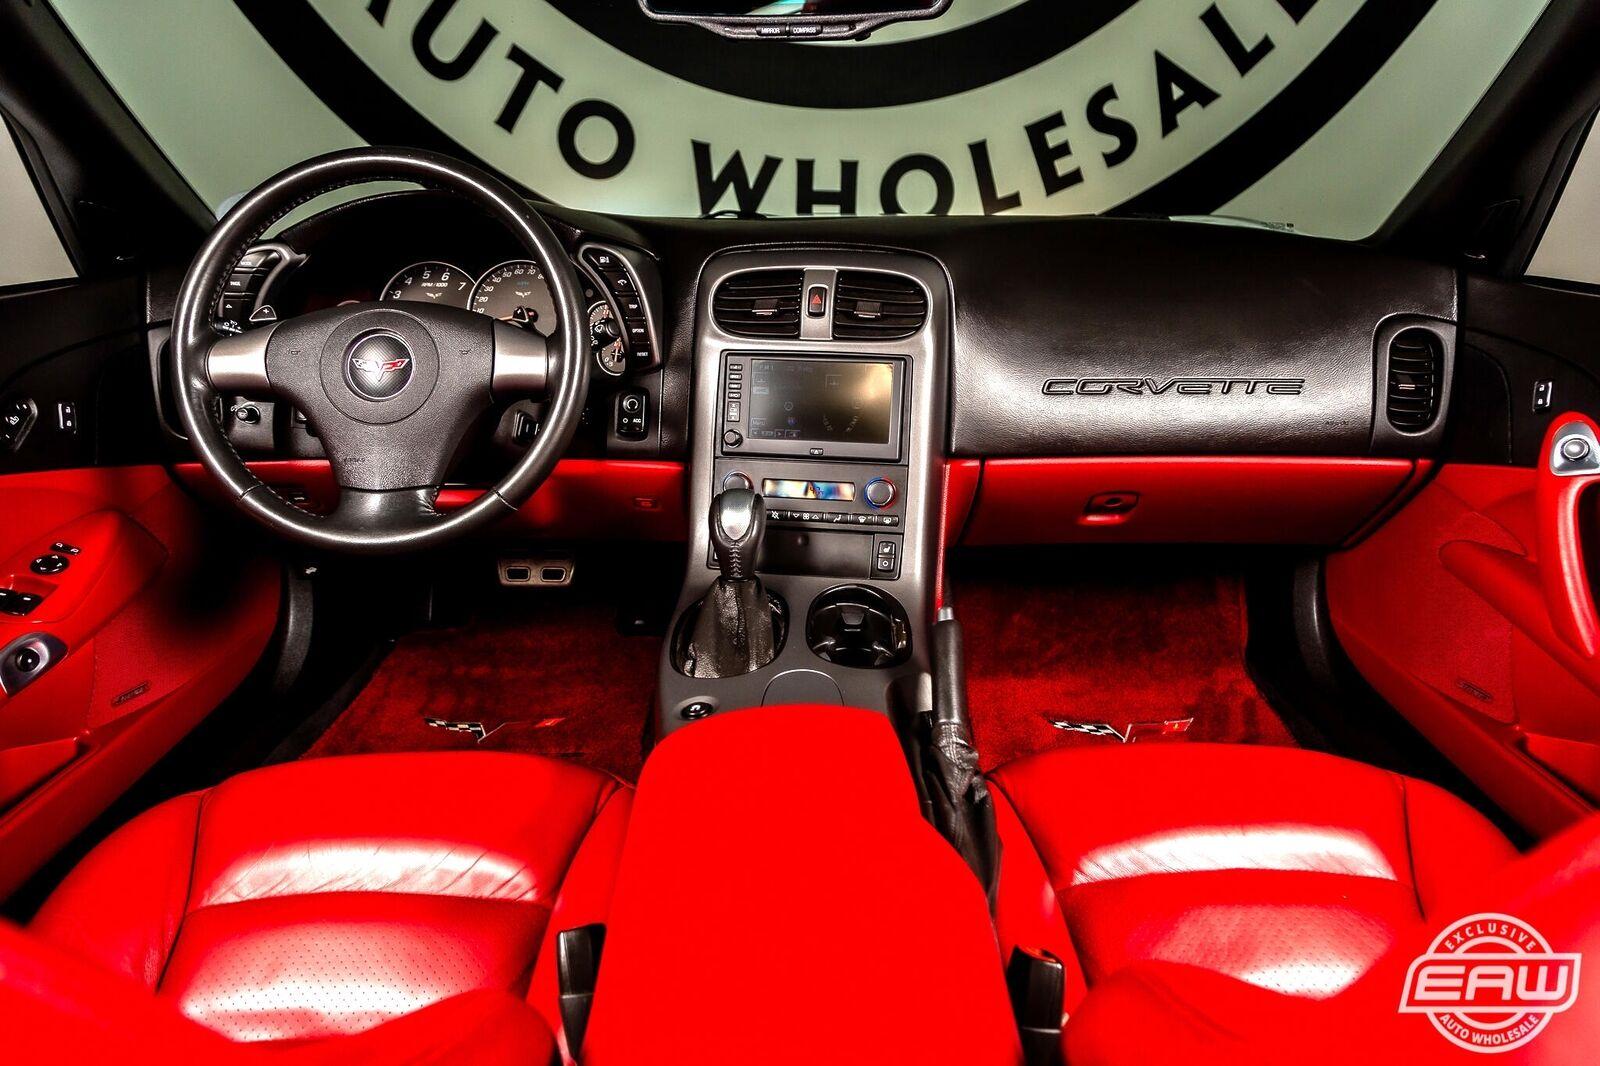 2006 White Chevrolet Corvette Convertible  | C6 Corvette Photo 3